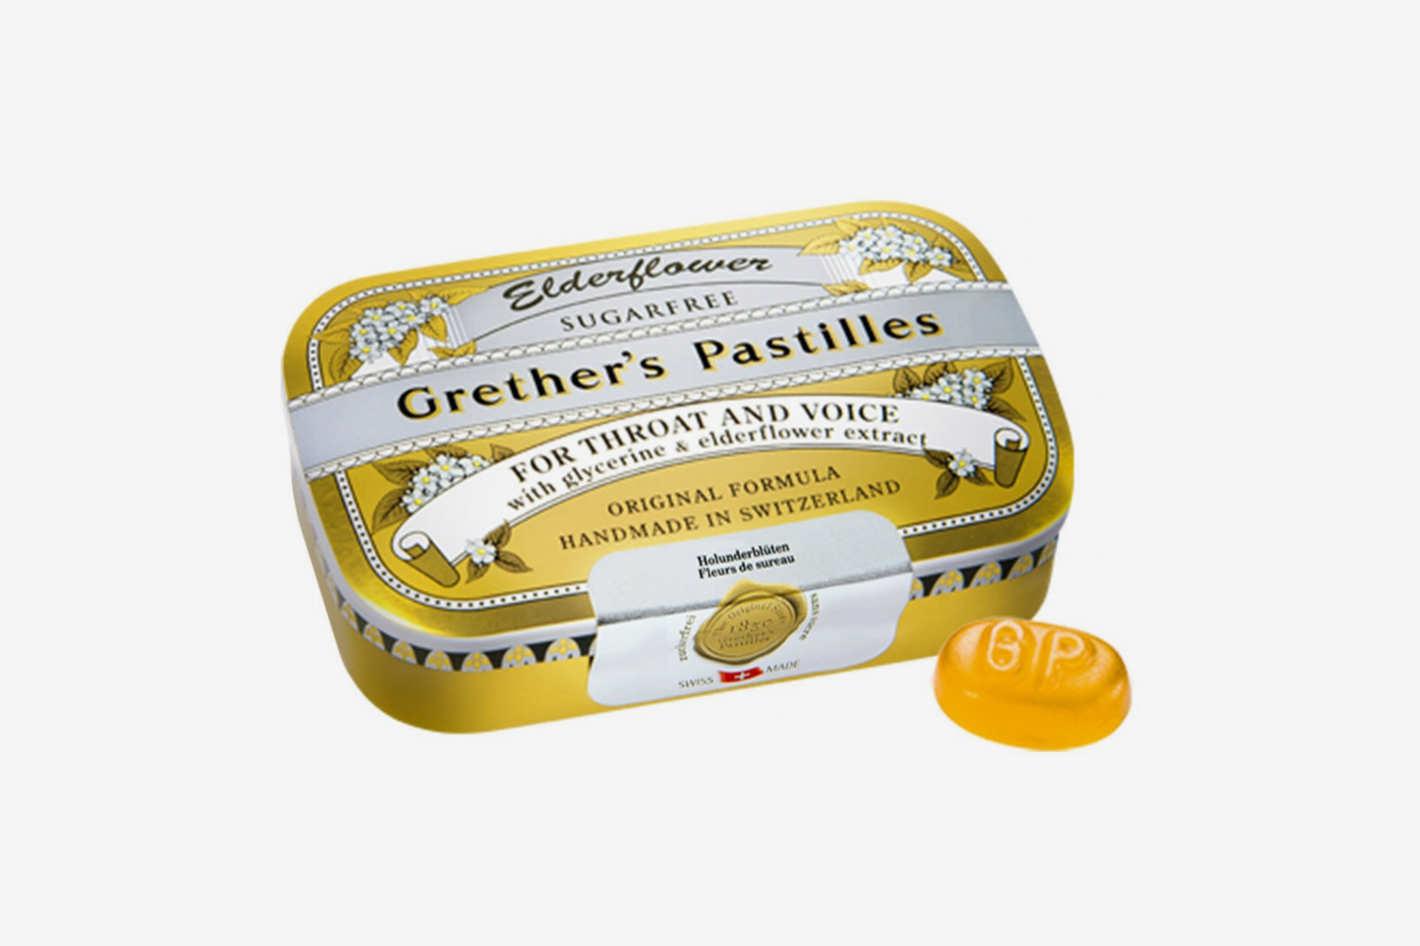 Grether's Pastilles Sugar-Free Elderflower Pastilles